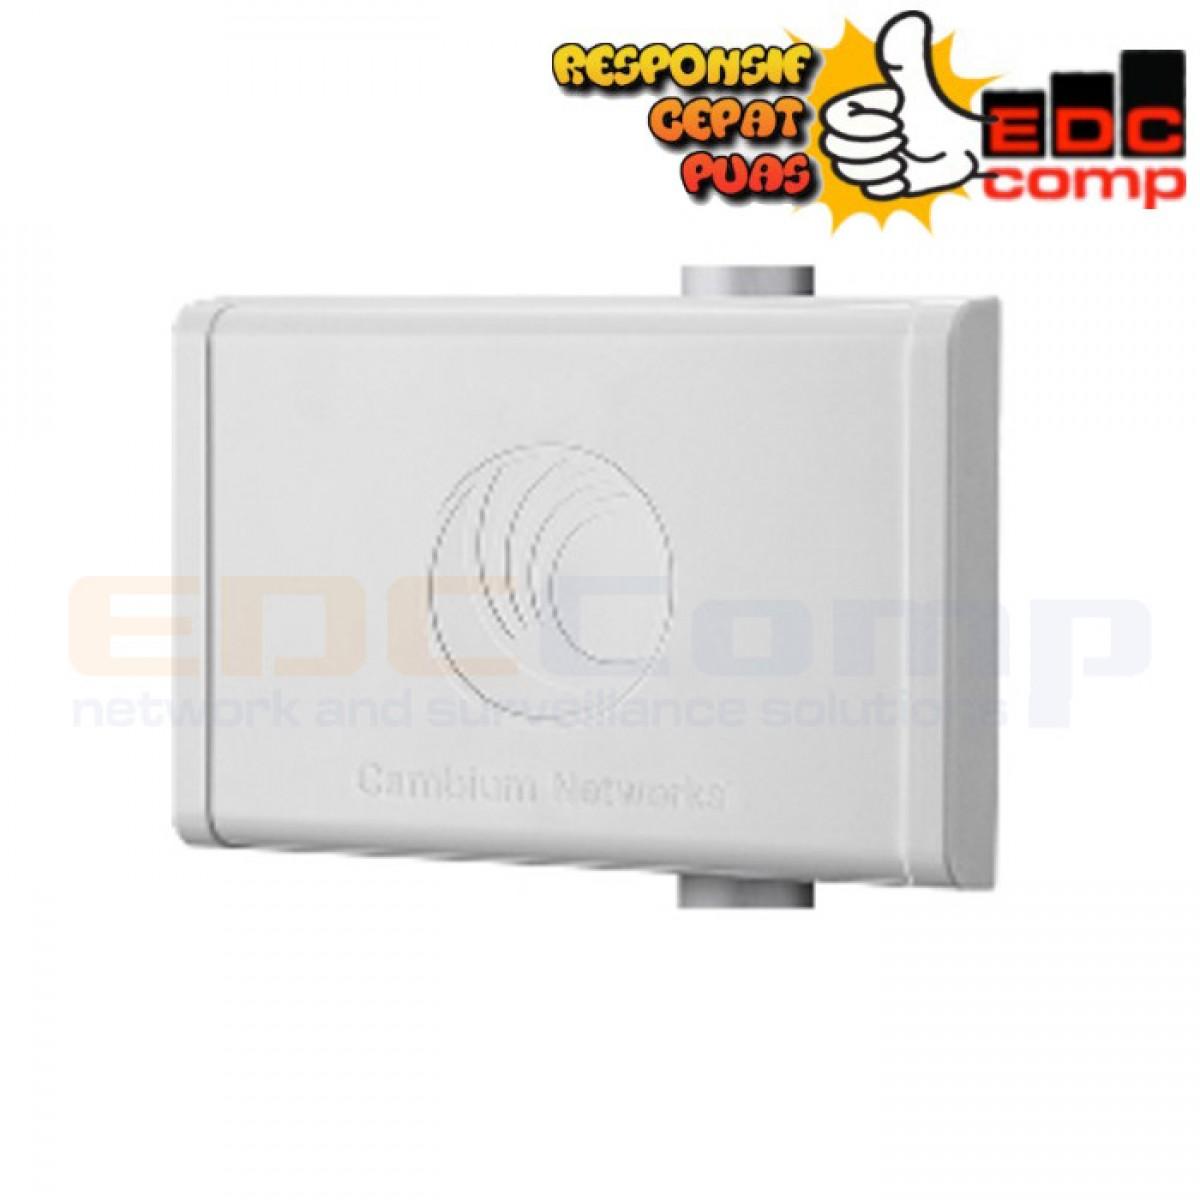 Cambium Networks ePMP Smart Antenna - EdcComp